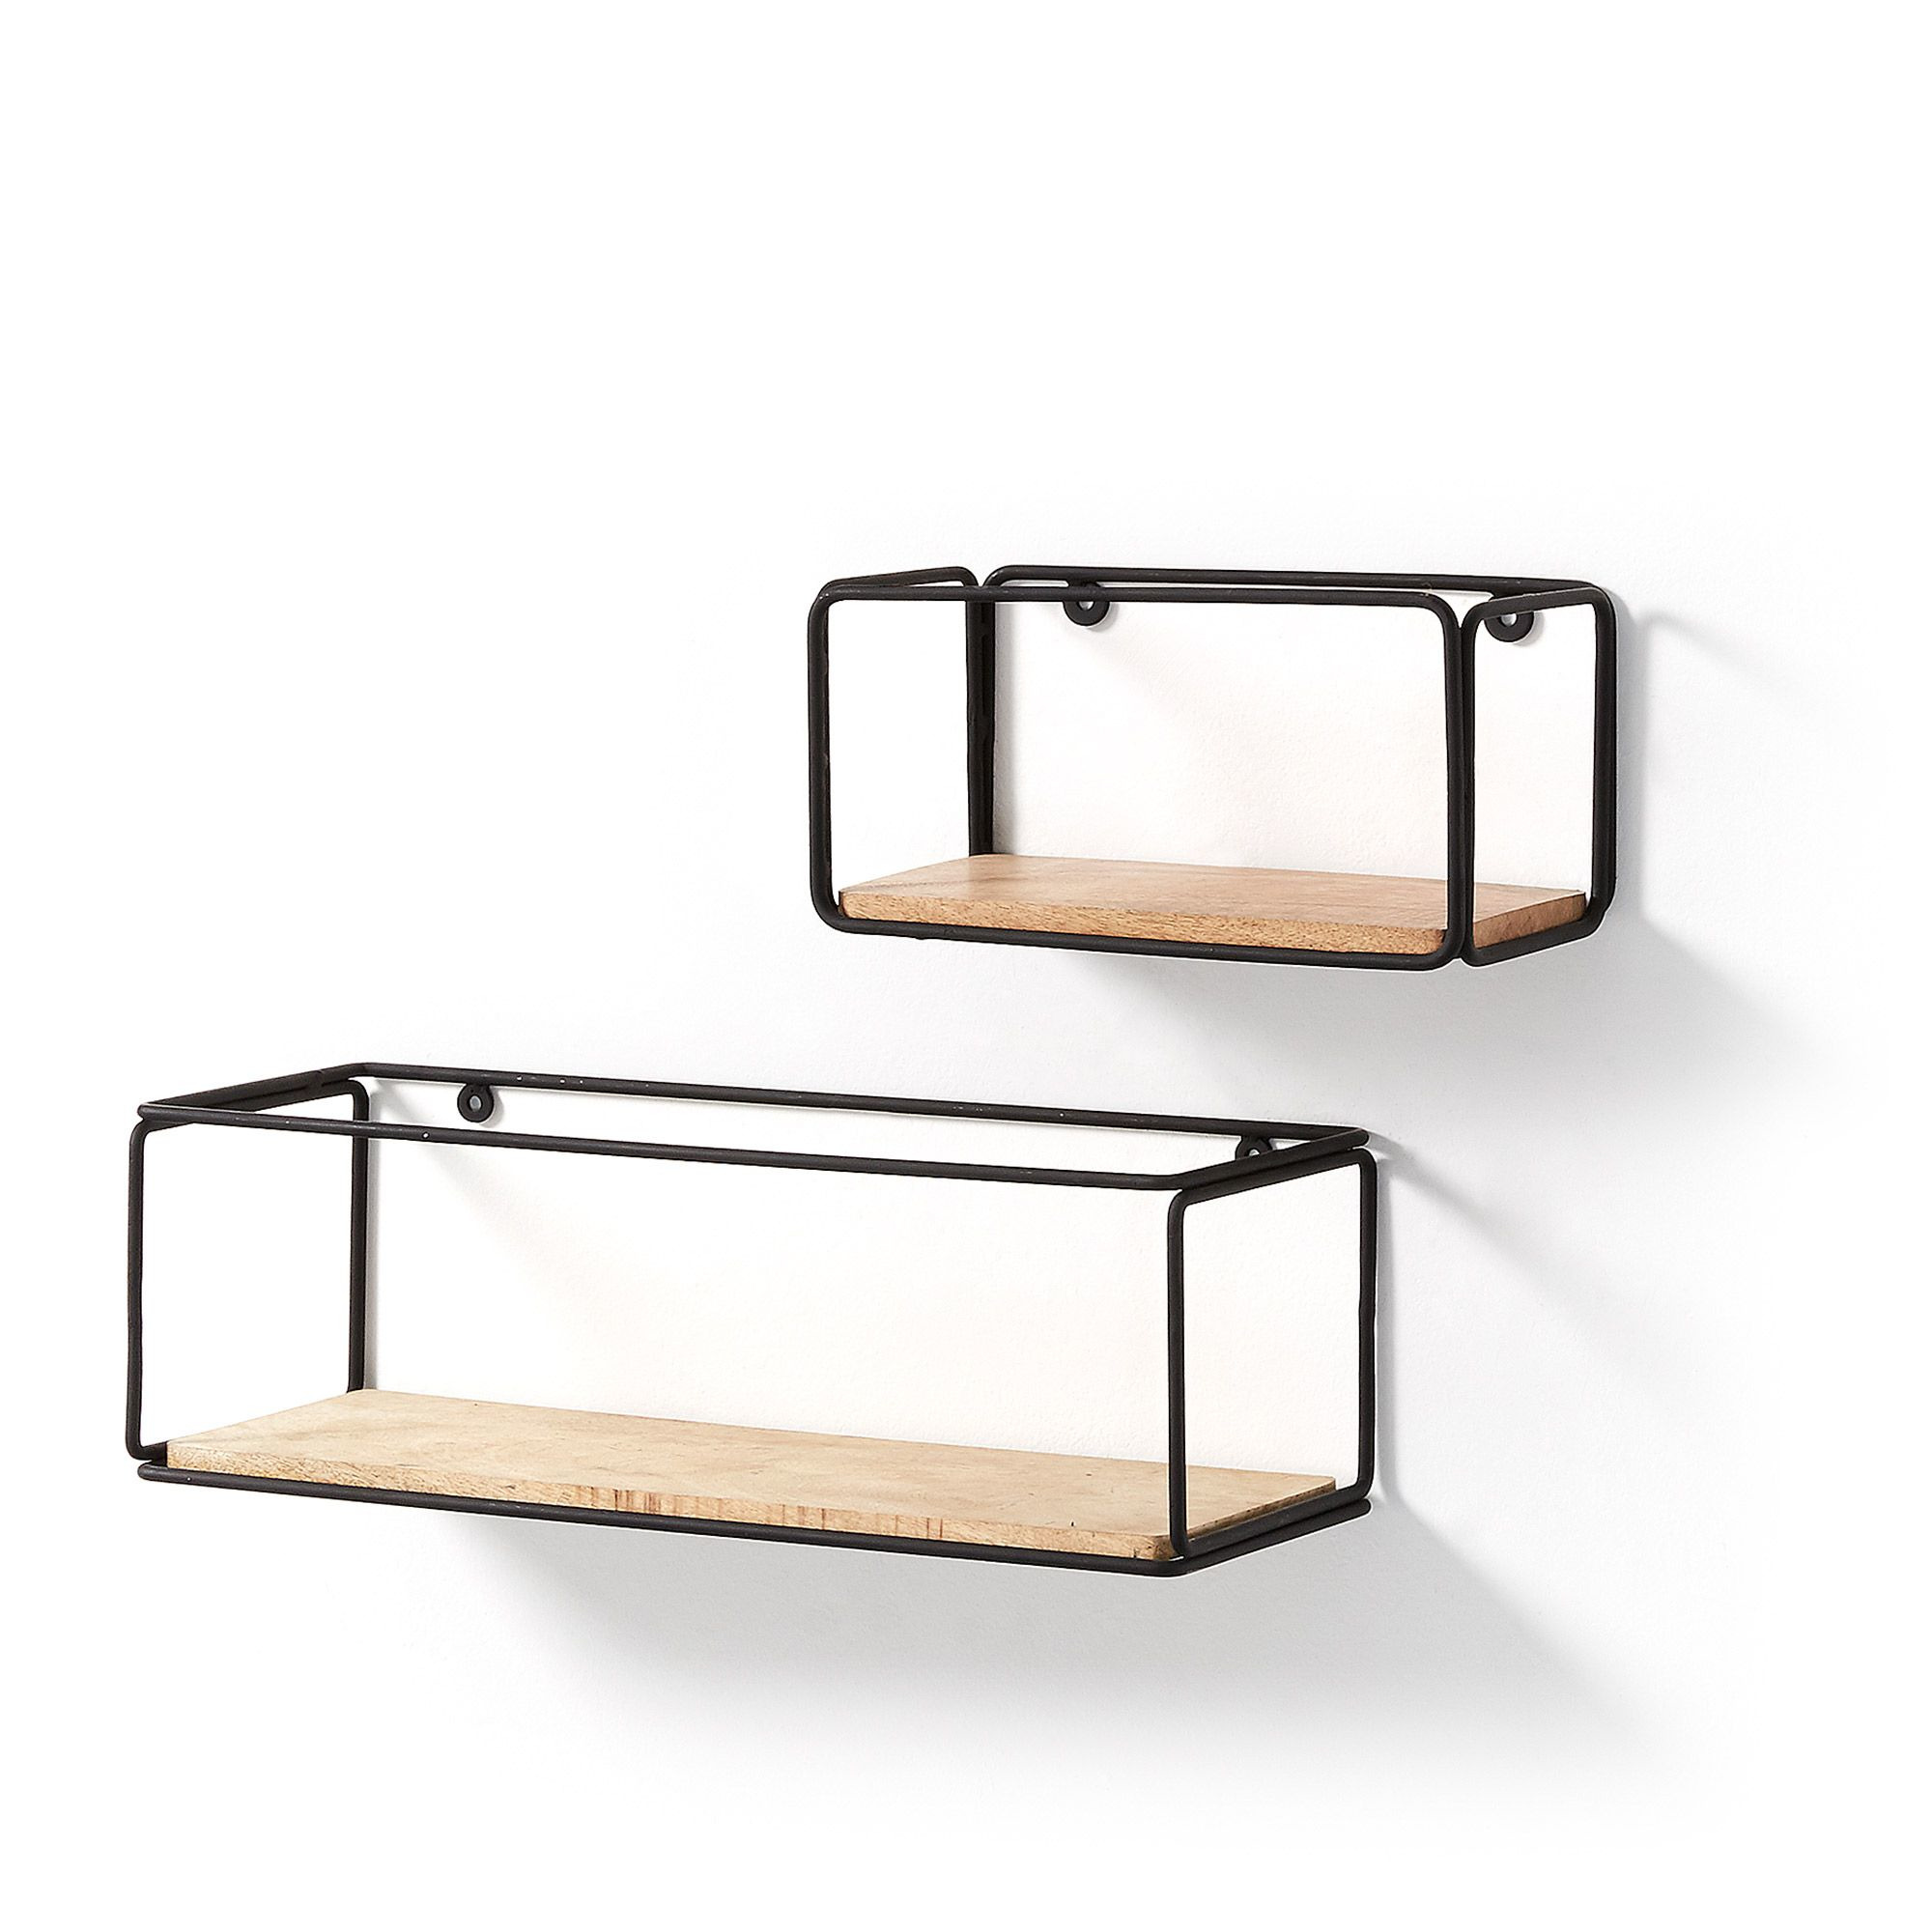 Wall Shelves Ness | Set of 2